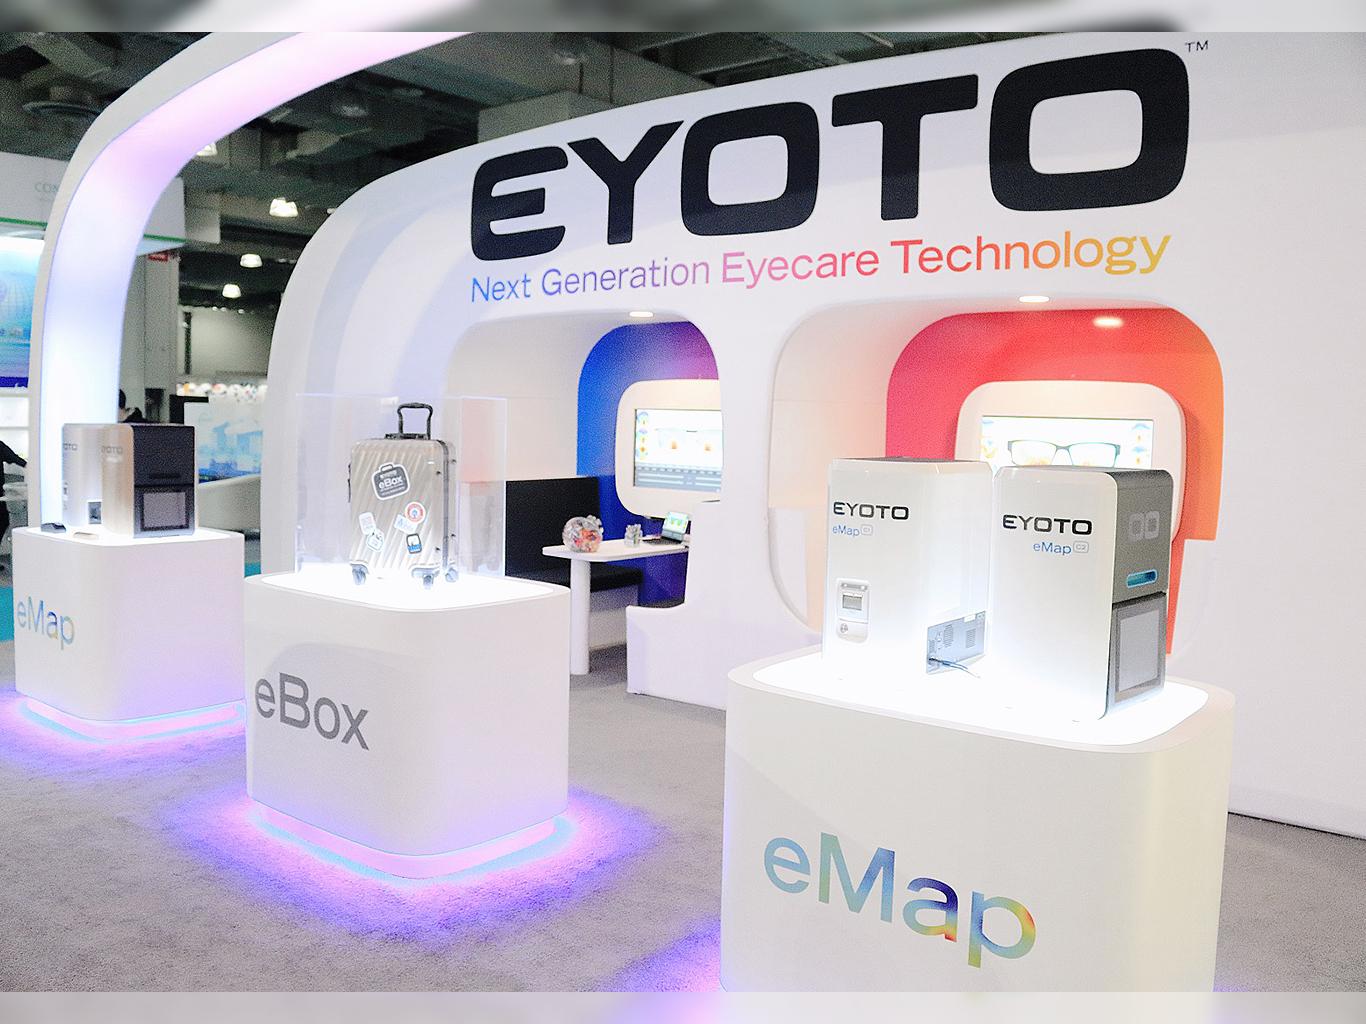 Booth Design exhibition design exhibition booth layout design layout booth design design branding brand